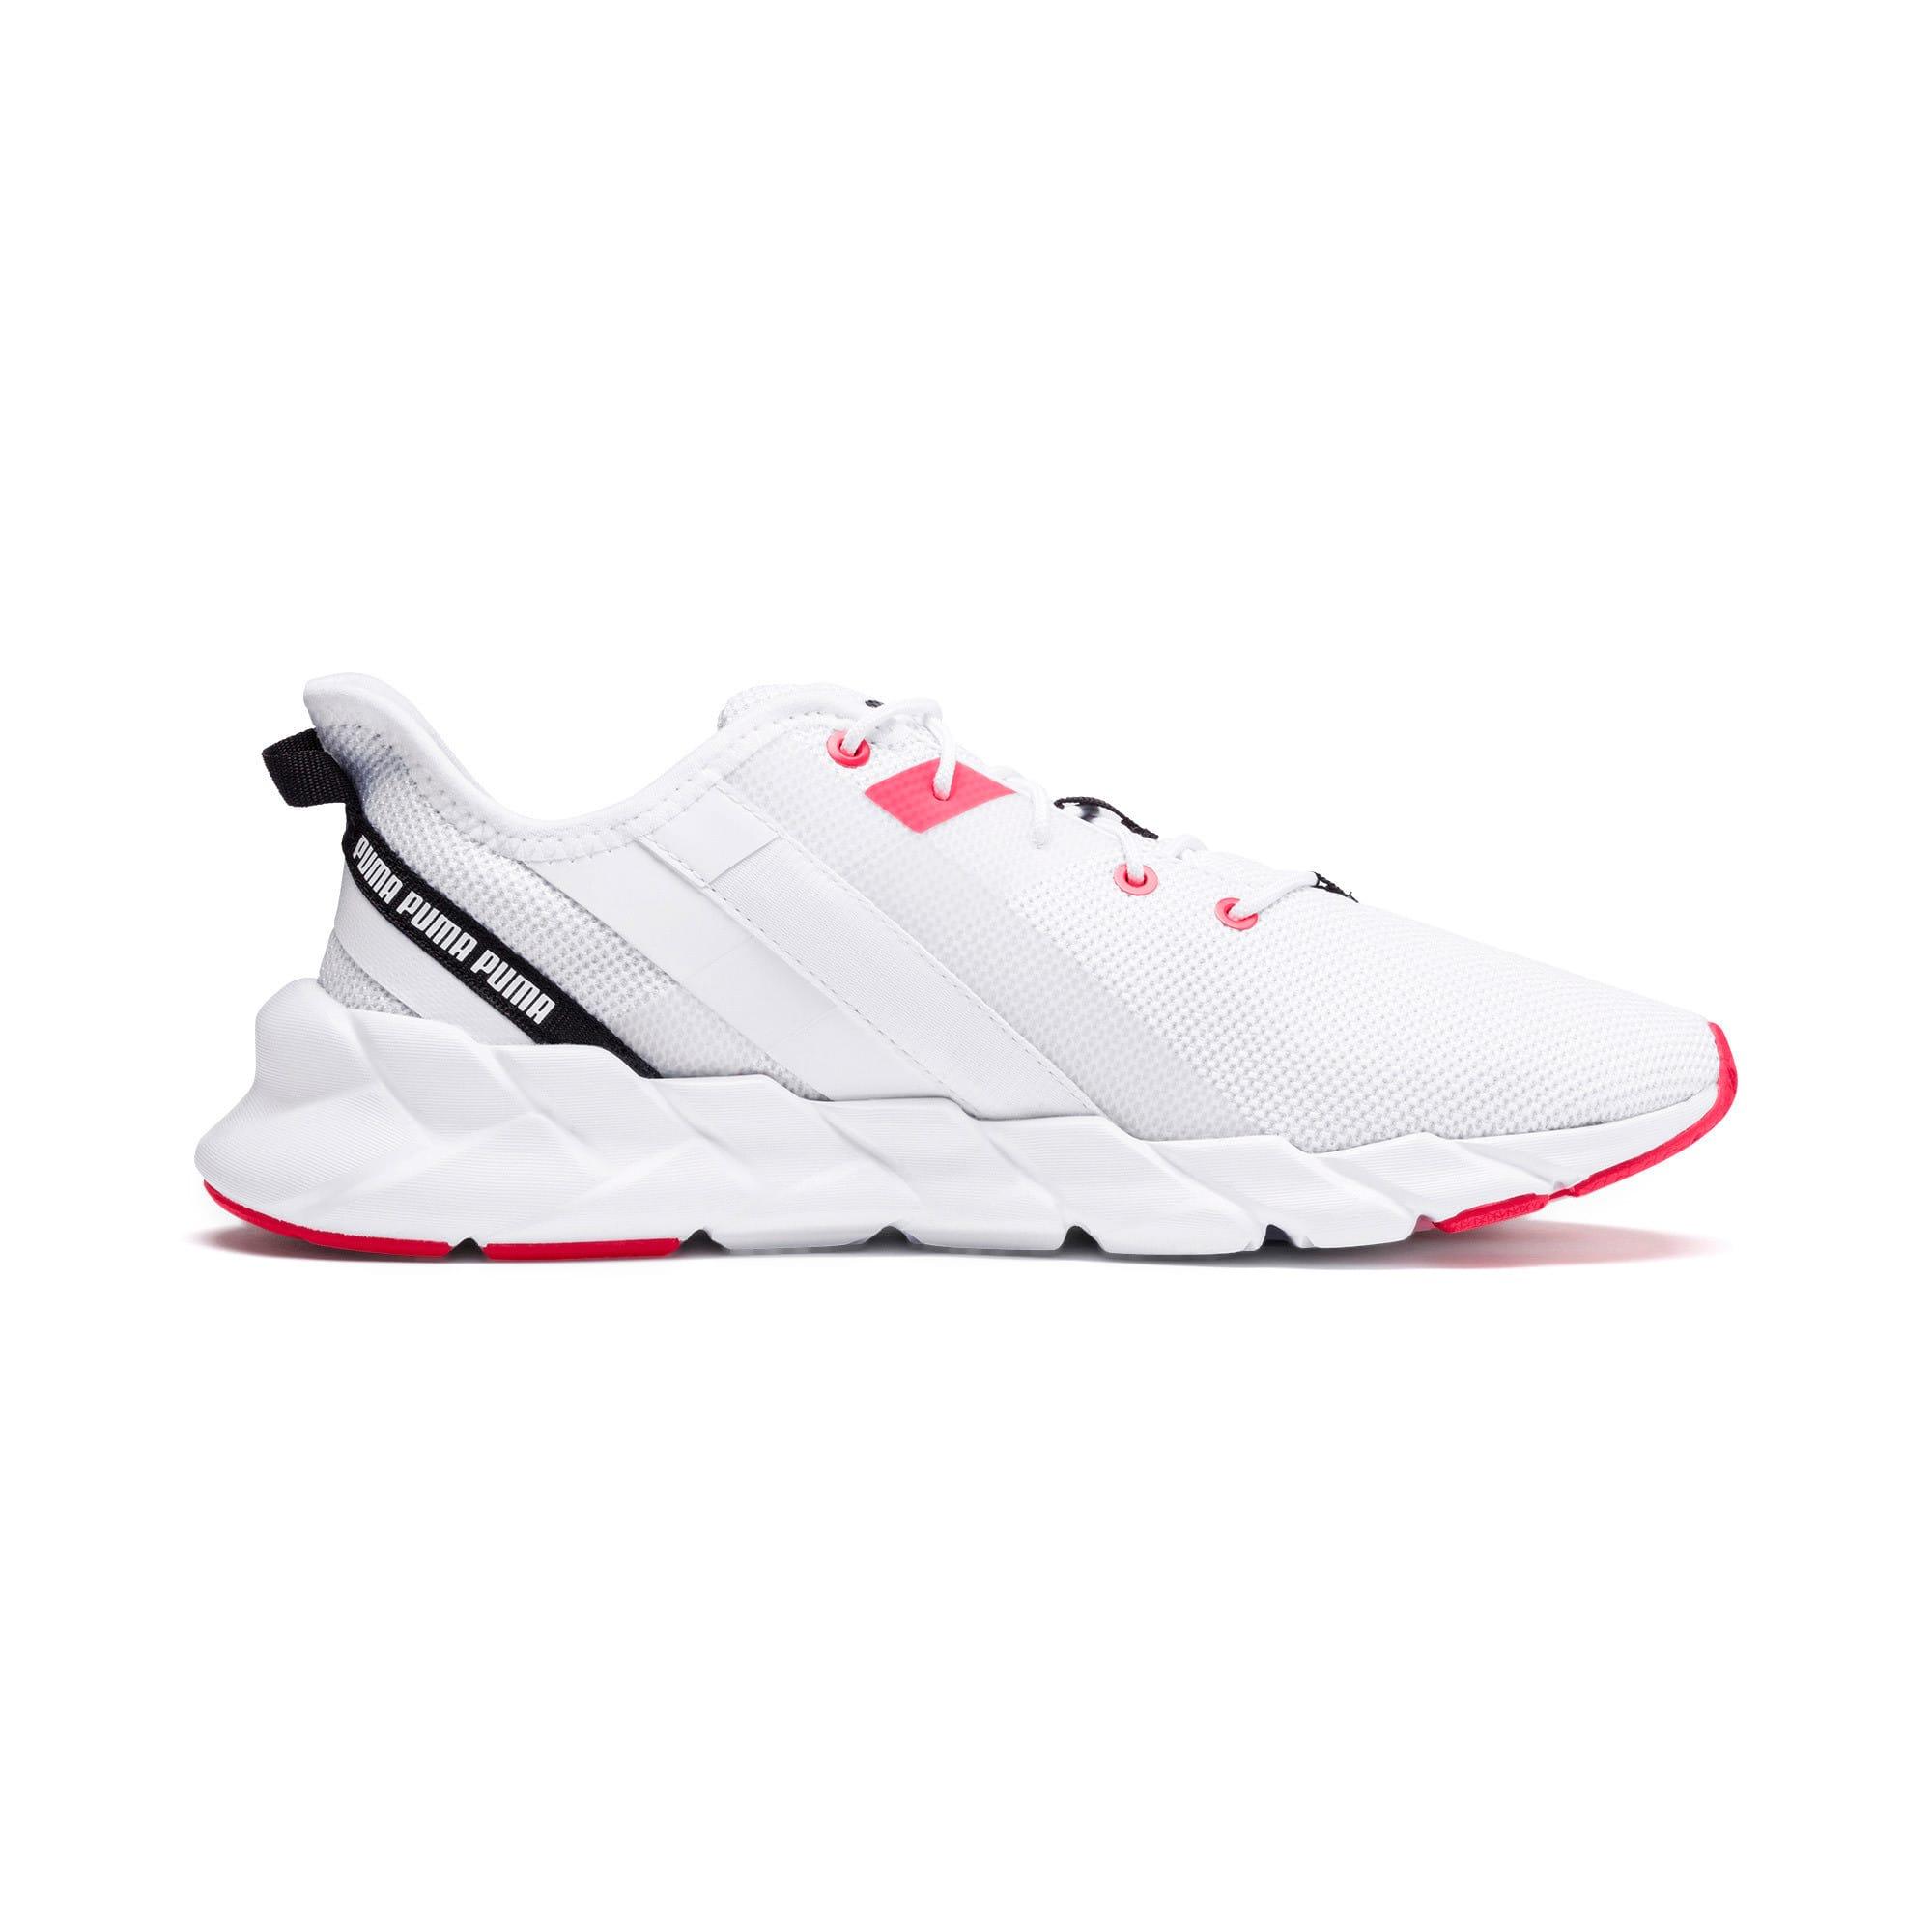 Thumbnail 10 of Weave XT Women's Training Shoes, Puma White-Pink Alert, medium